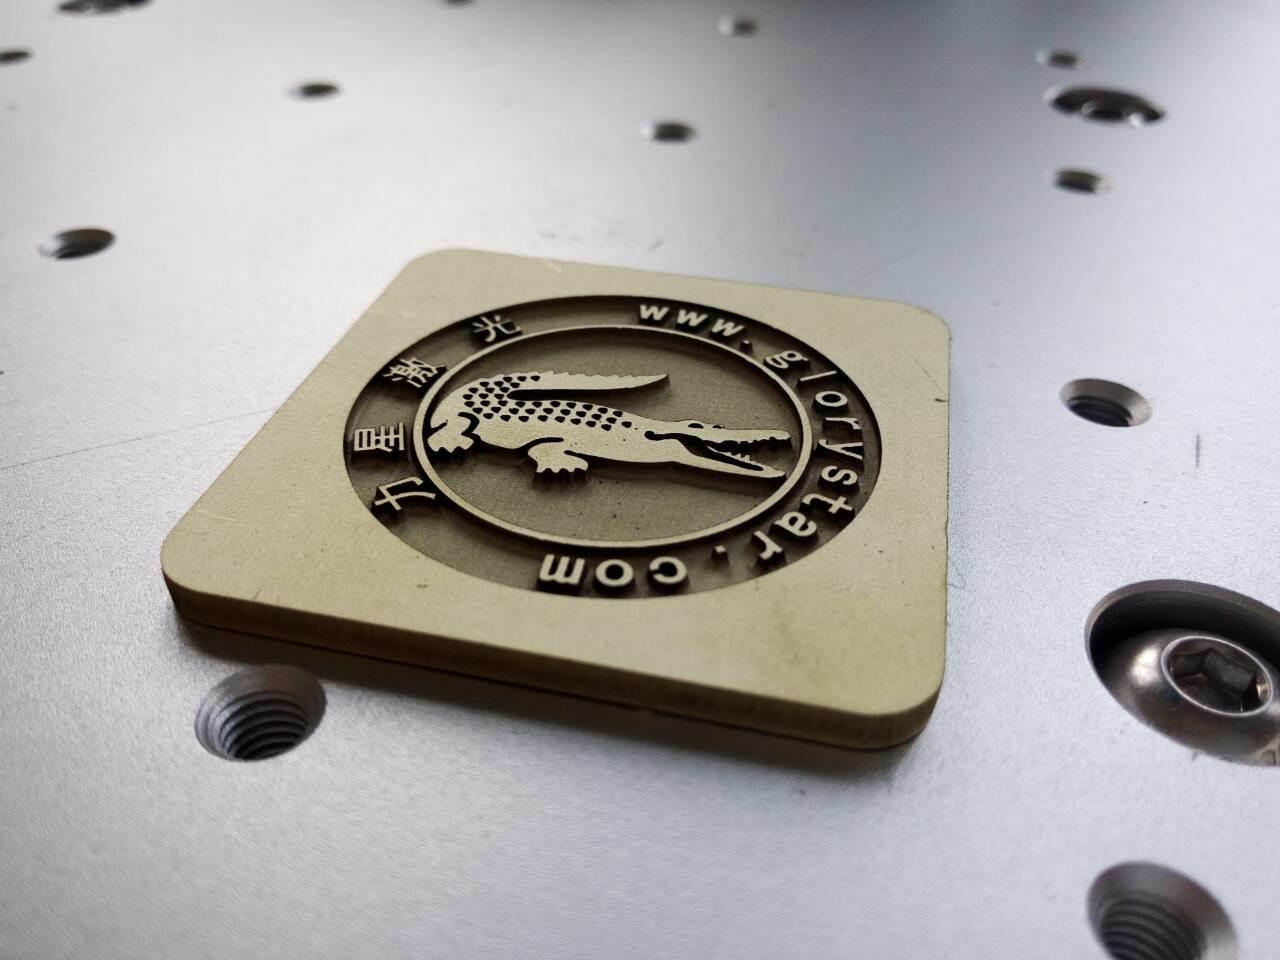 Fiber Metal Laser Cutting with Good Effect of Cut Edge